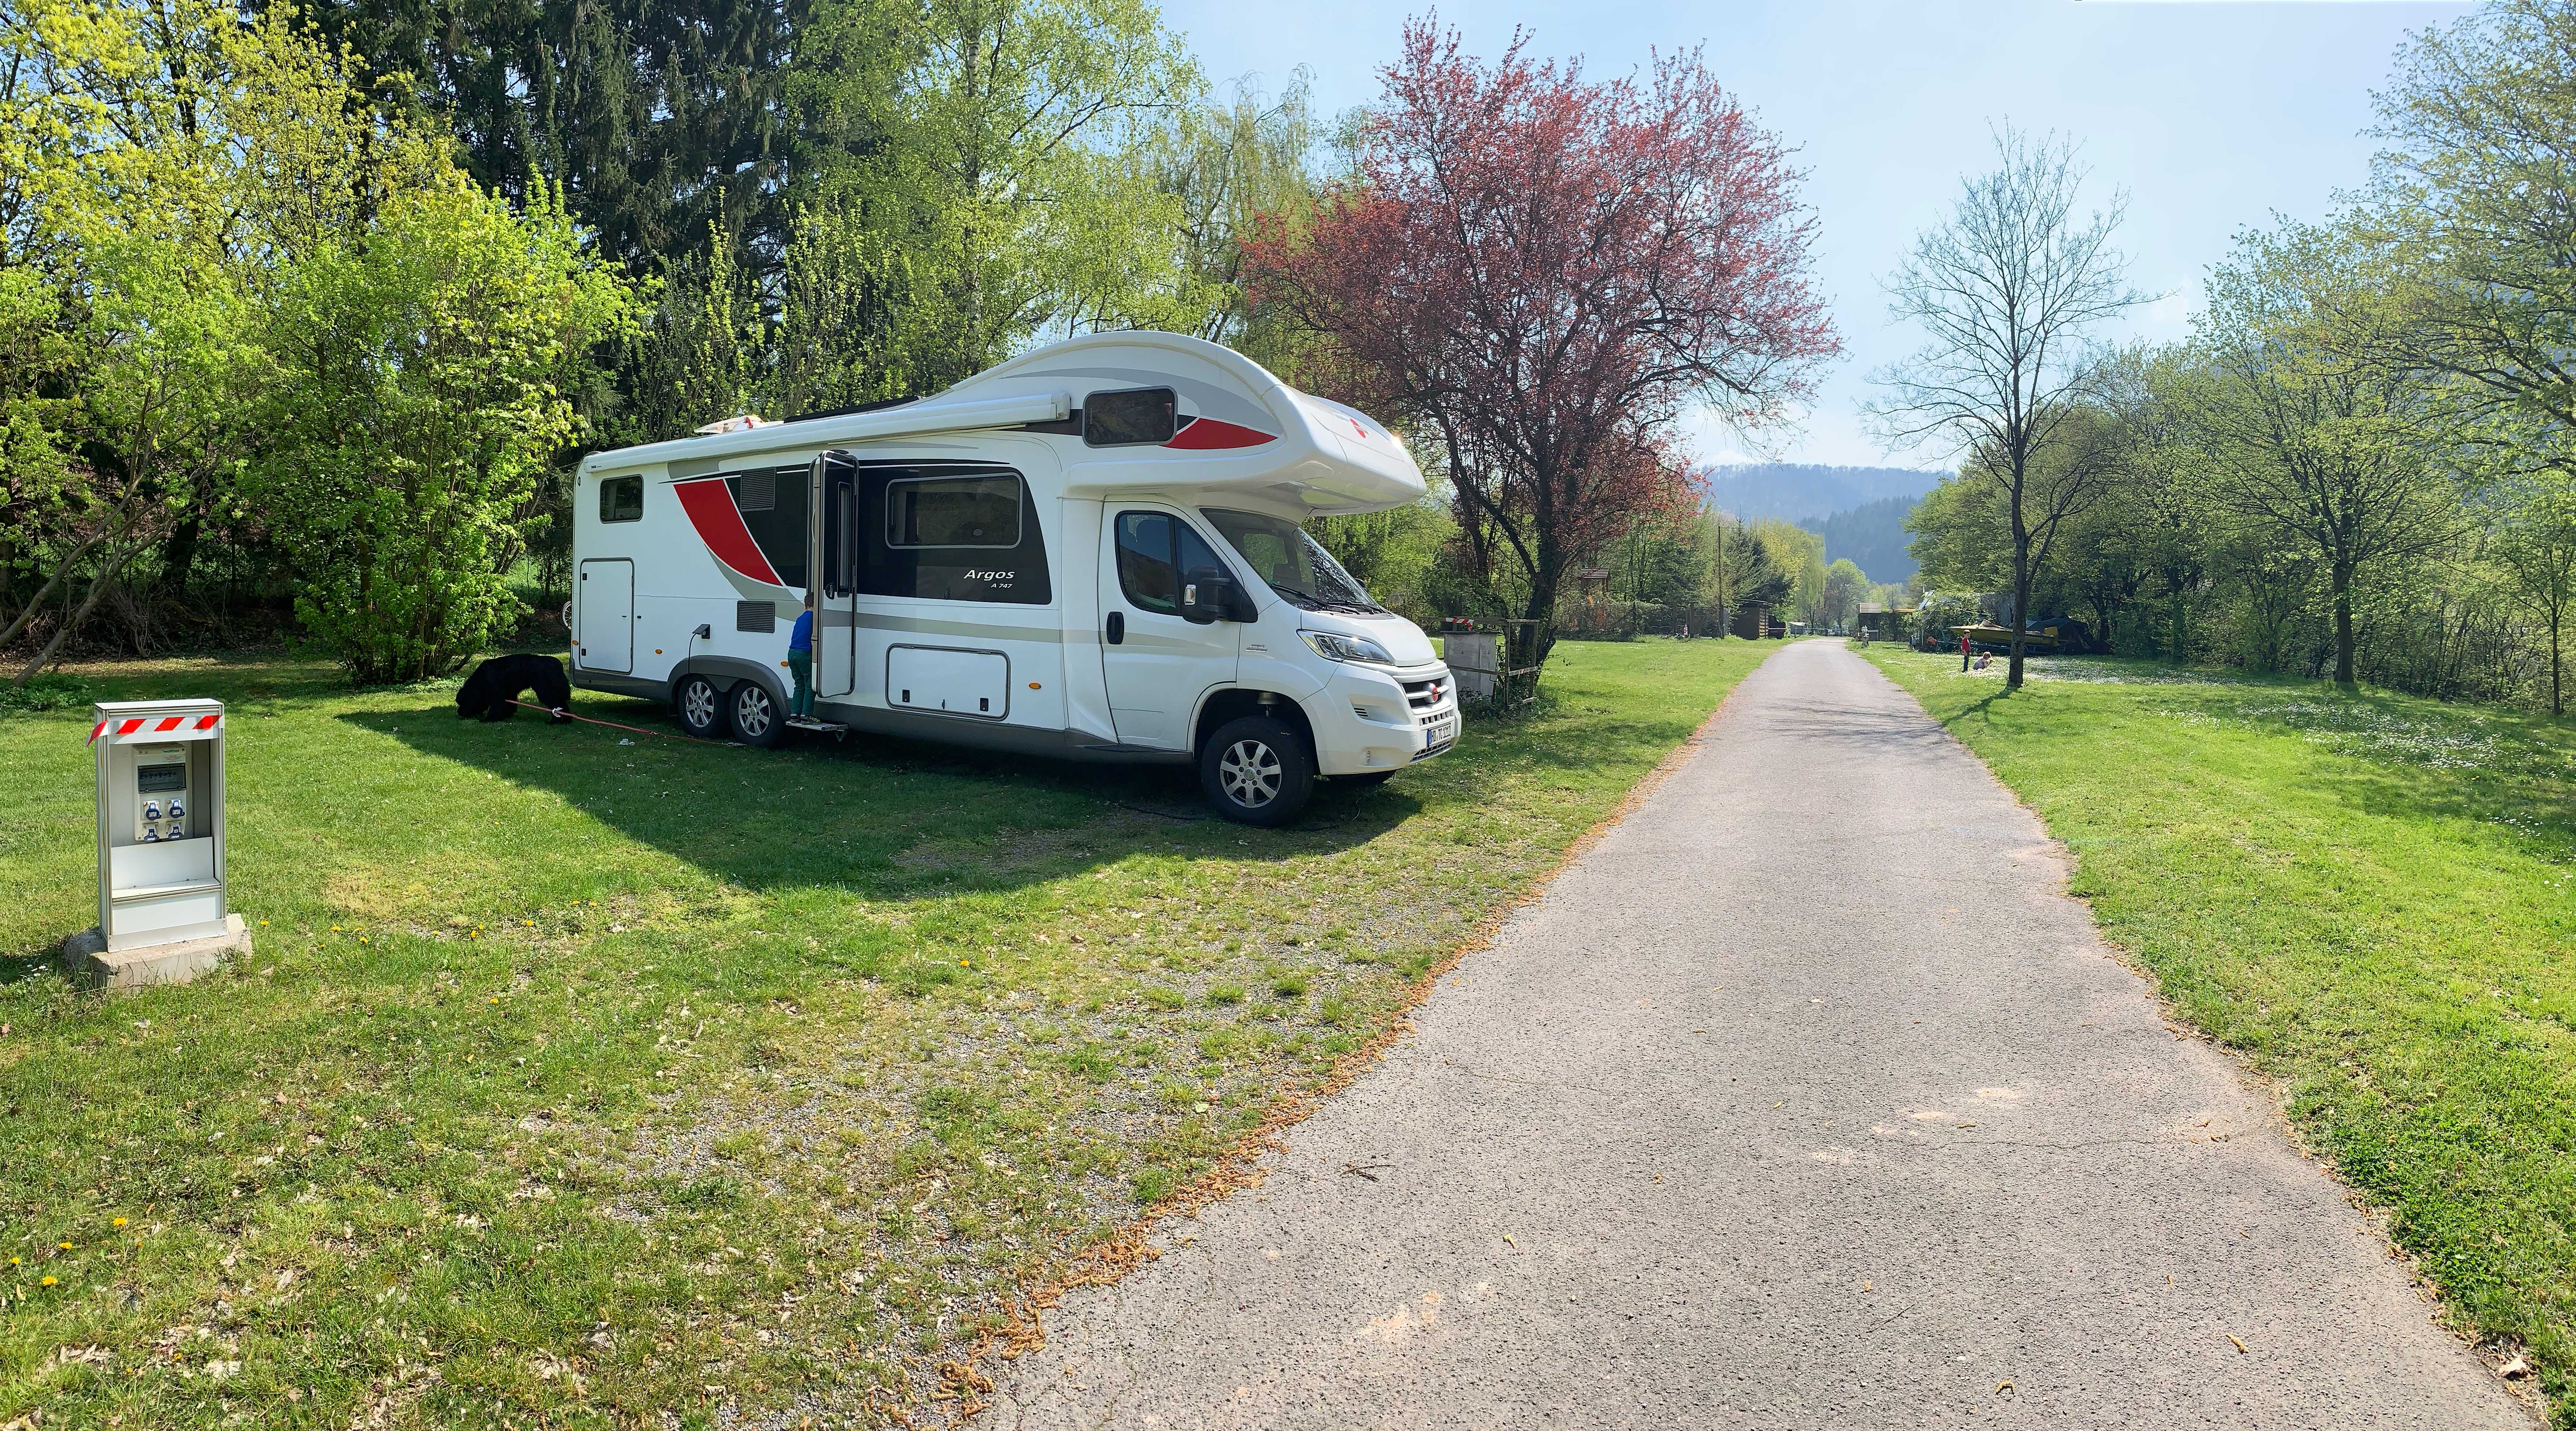 Campingplatz Haide01